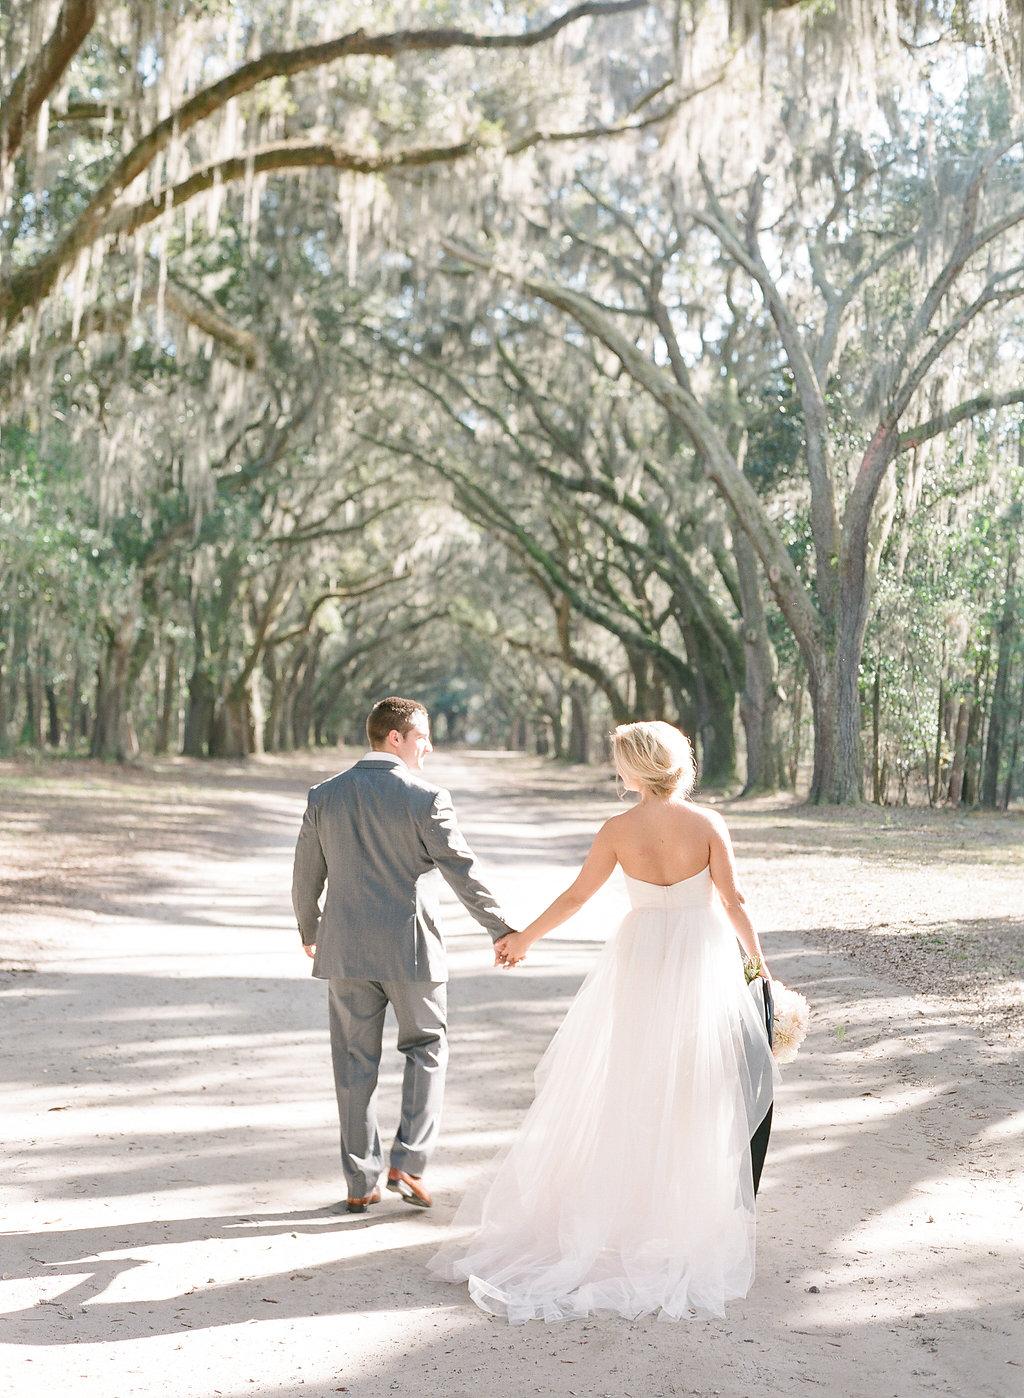 the-happy-bloom-wormsloe-wedding-savannah-wedding-ivory-and-beau-bridal-boutique-savannah-wedding-dresses-savannah-bridal-boutique-georgia-bridal-boutique-design-studio-south-sunset-wedding-blush-by-hayley-paige-candi-1550-blush-wedding-dress-16.jpg